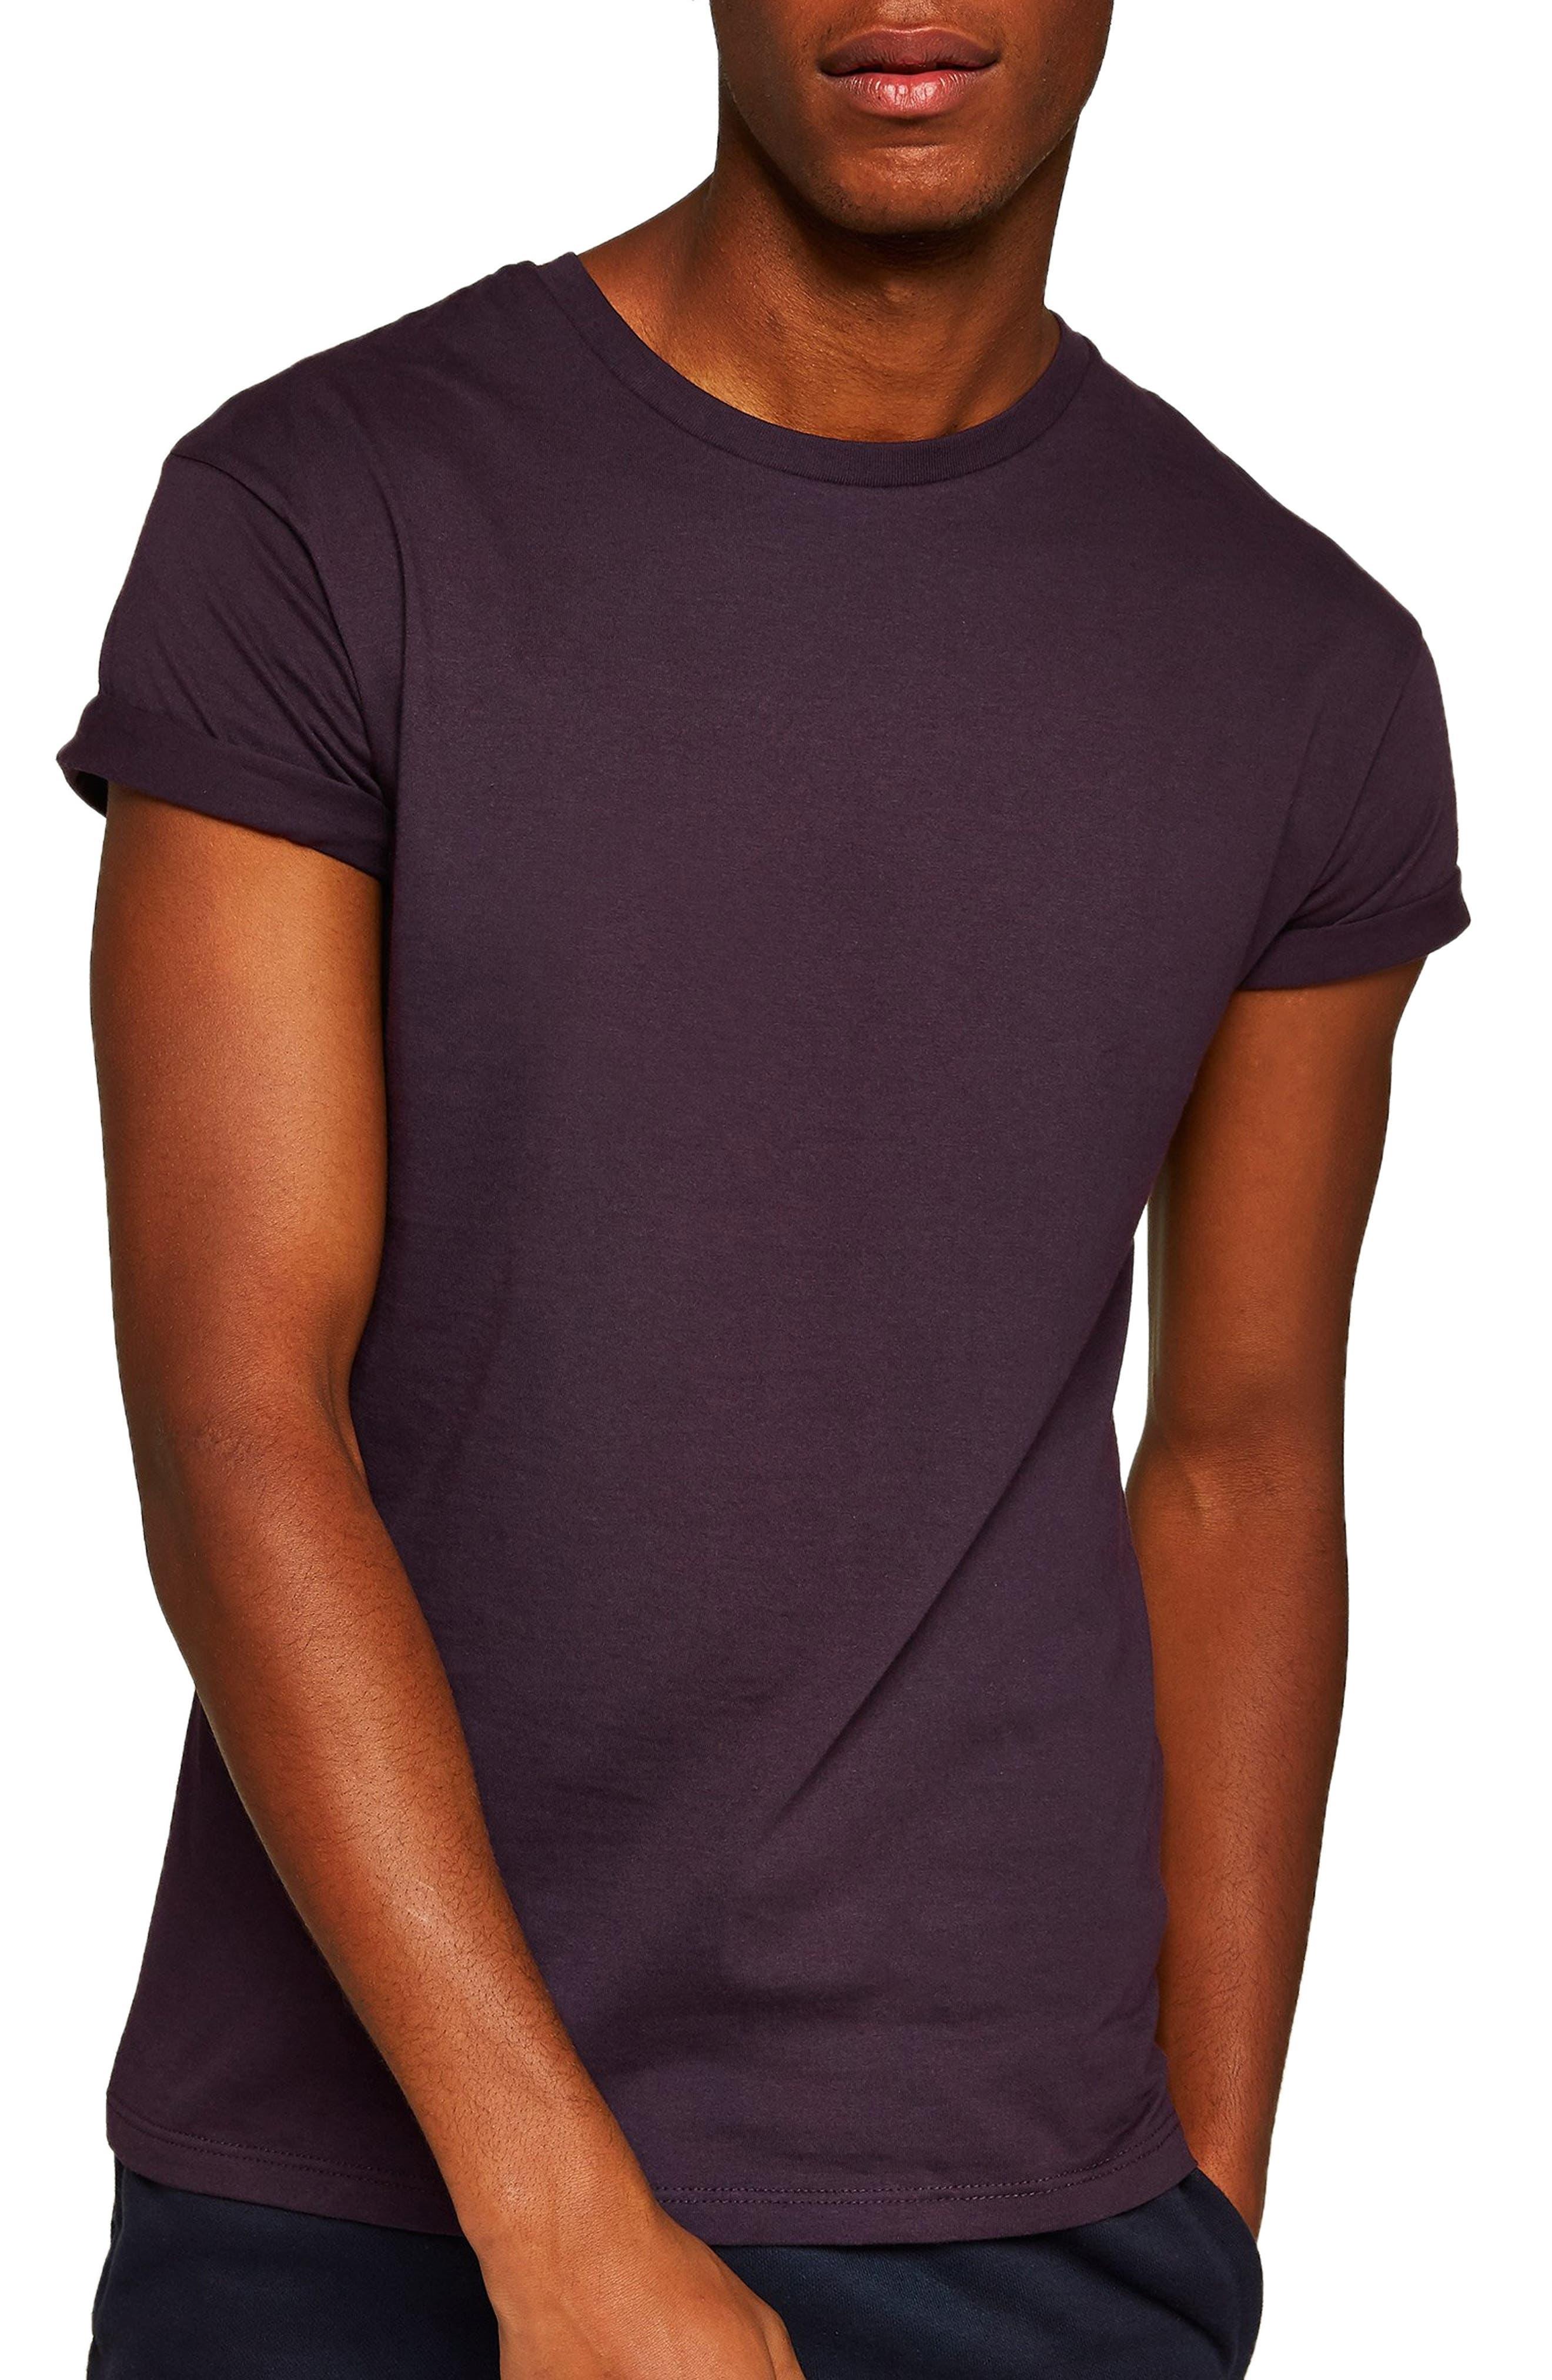 Muscle Fit Roller T-Shirt,                             Main thumbnail 1, color,                             PURPLE